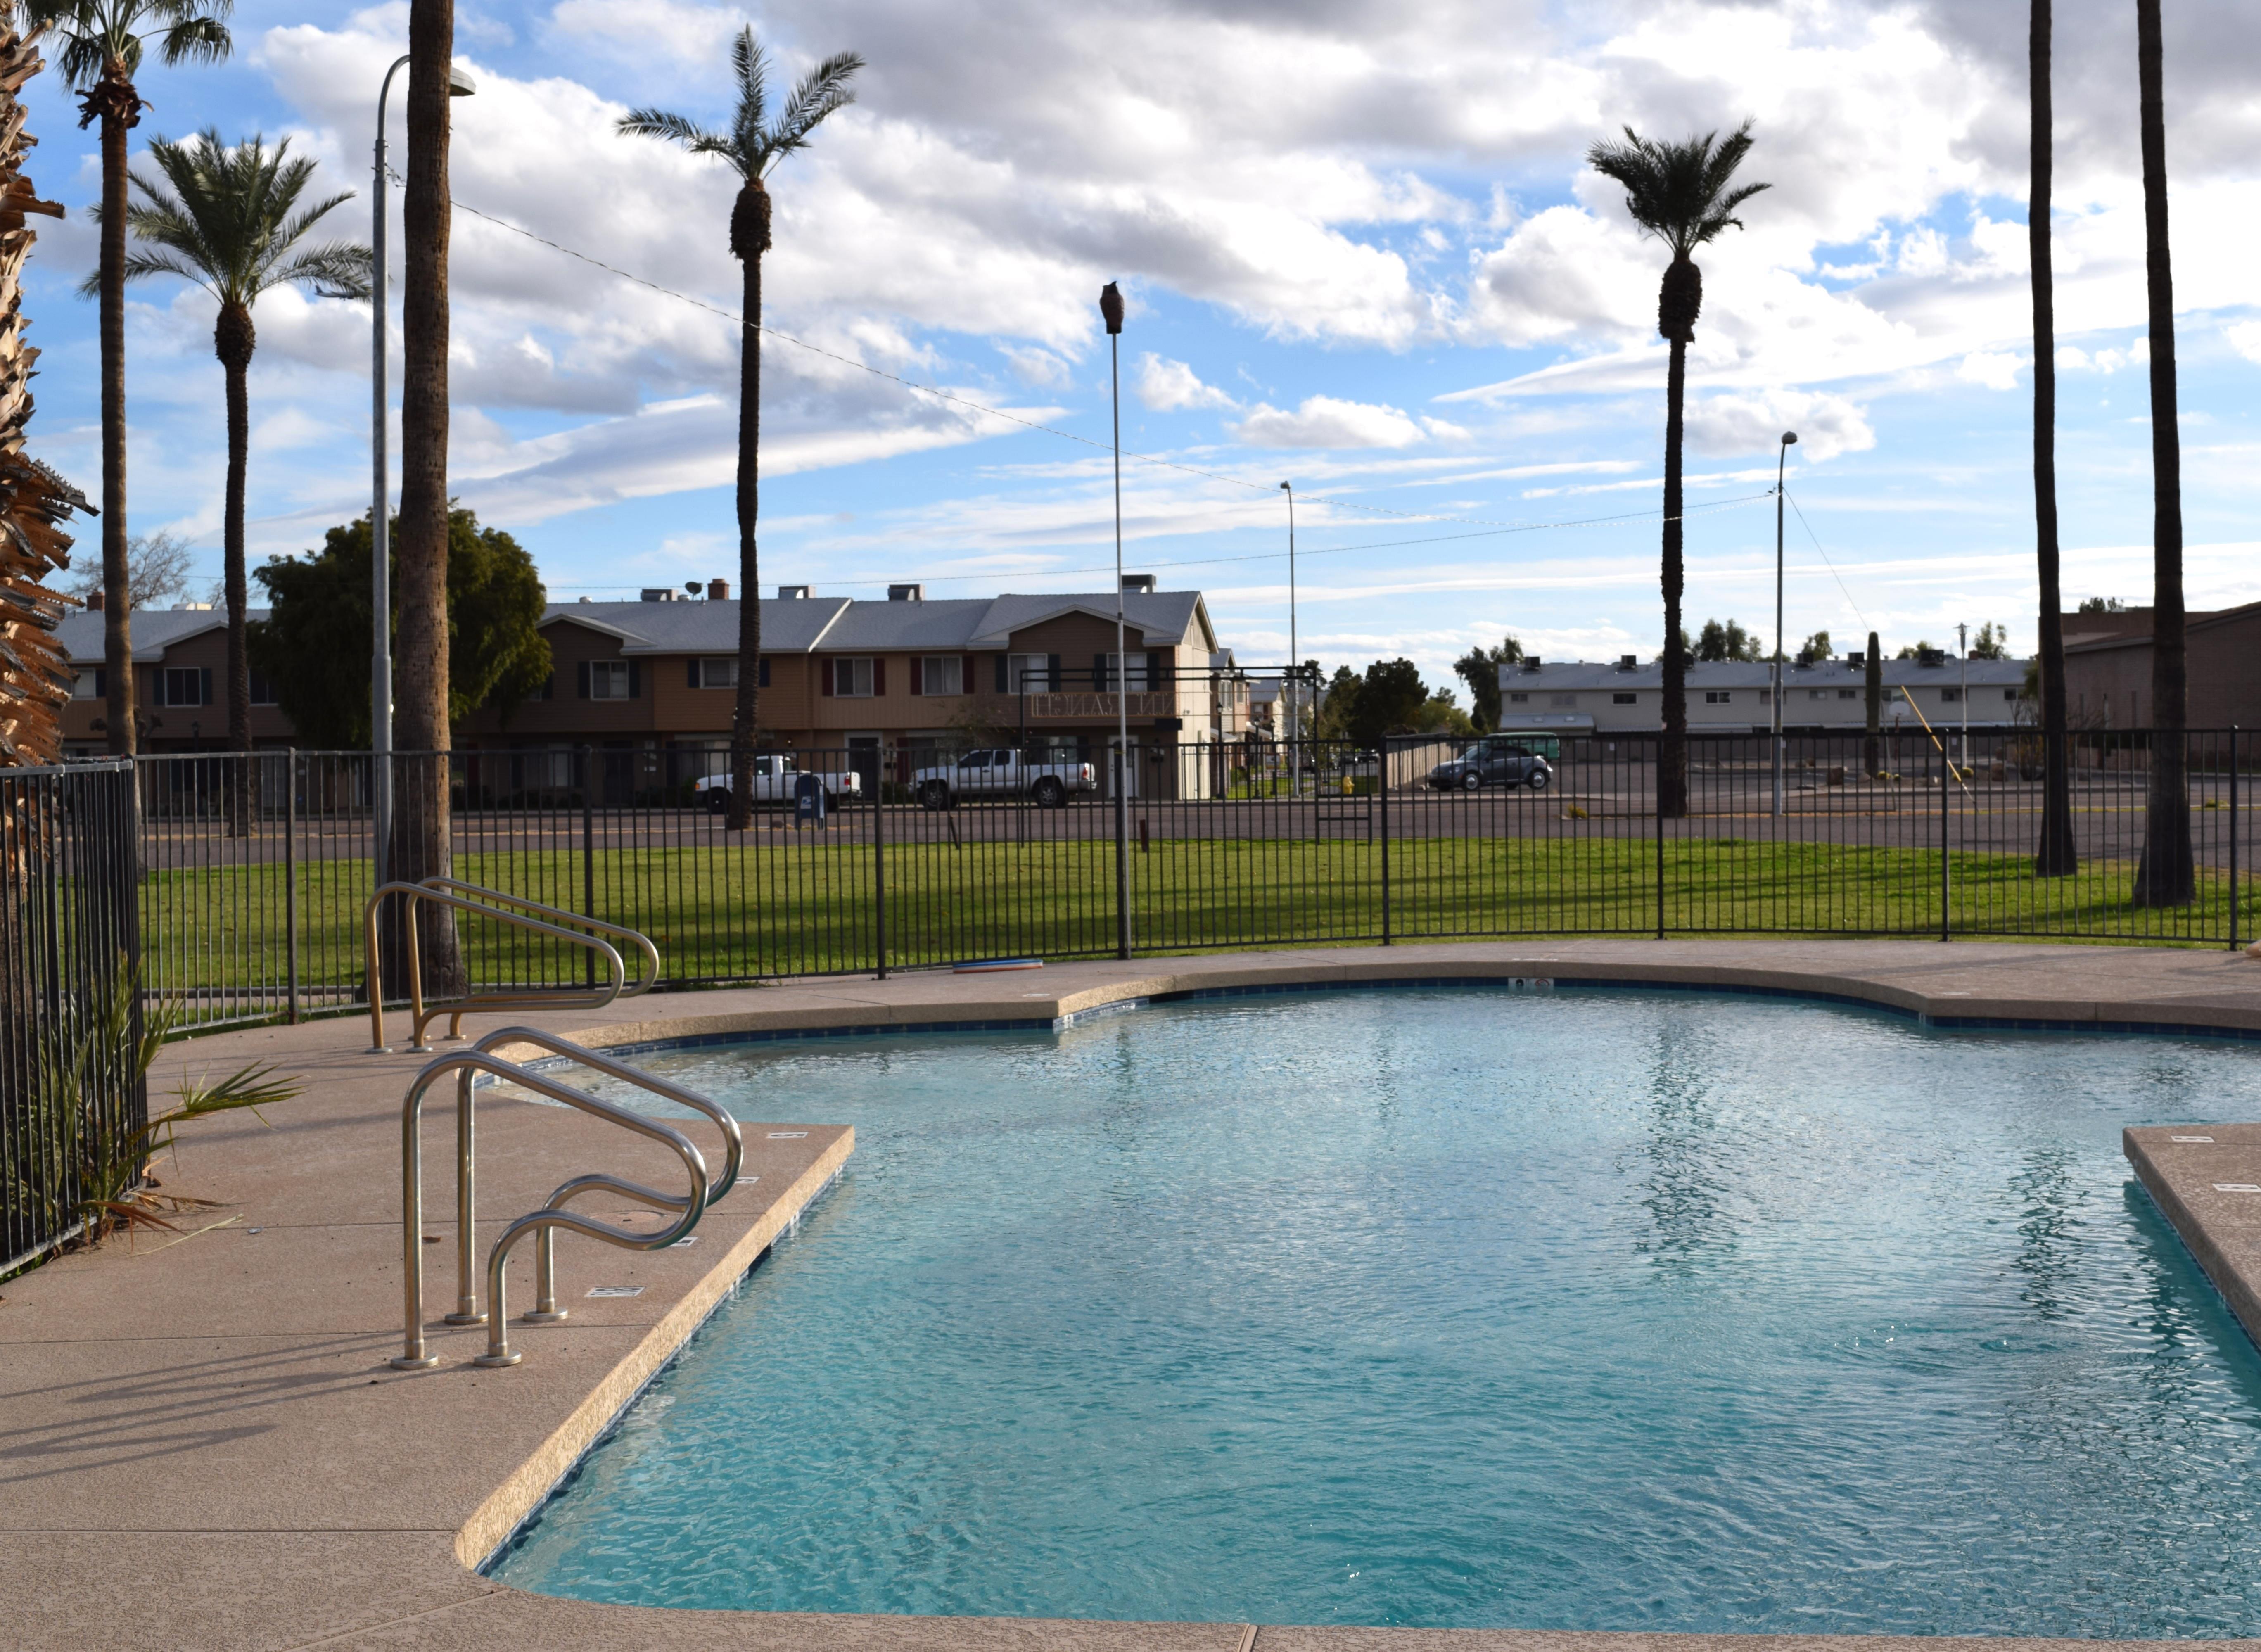 Scottsdale Rv Parks Reviews And Photos Rvparking Com